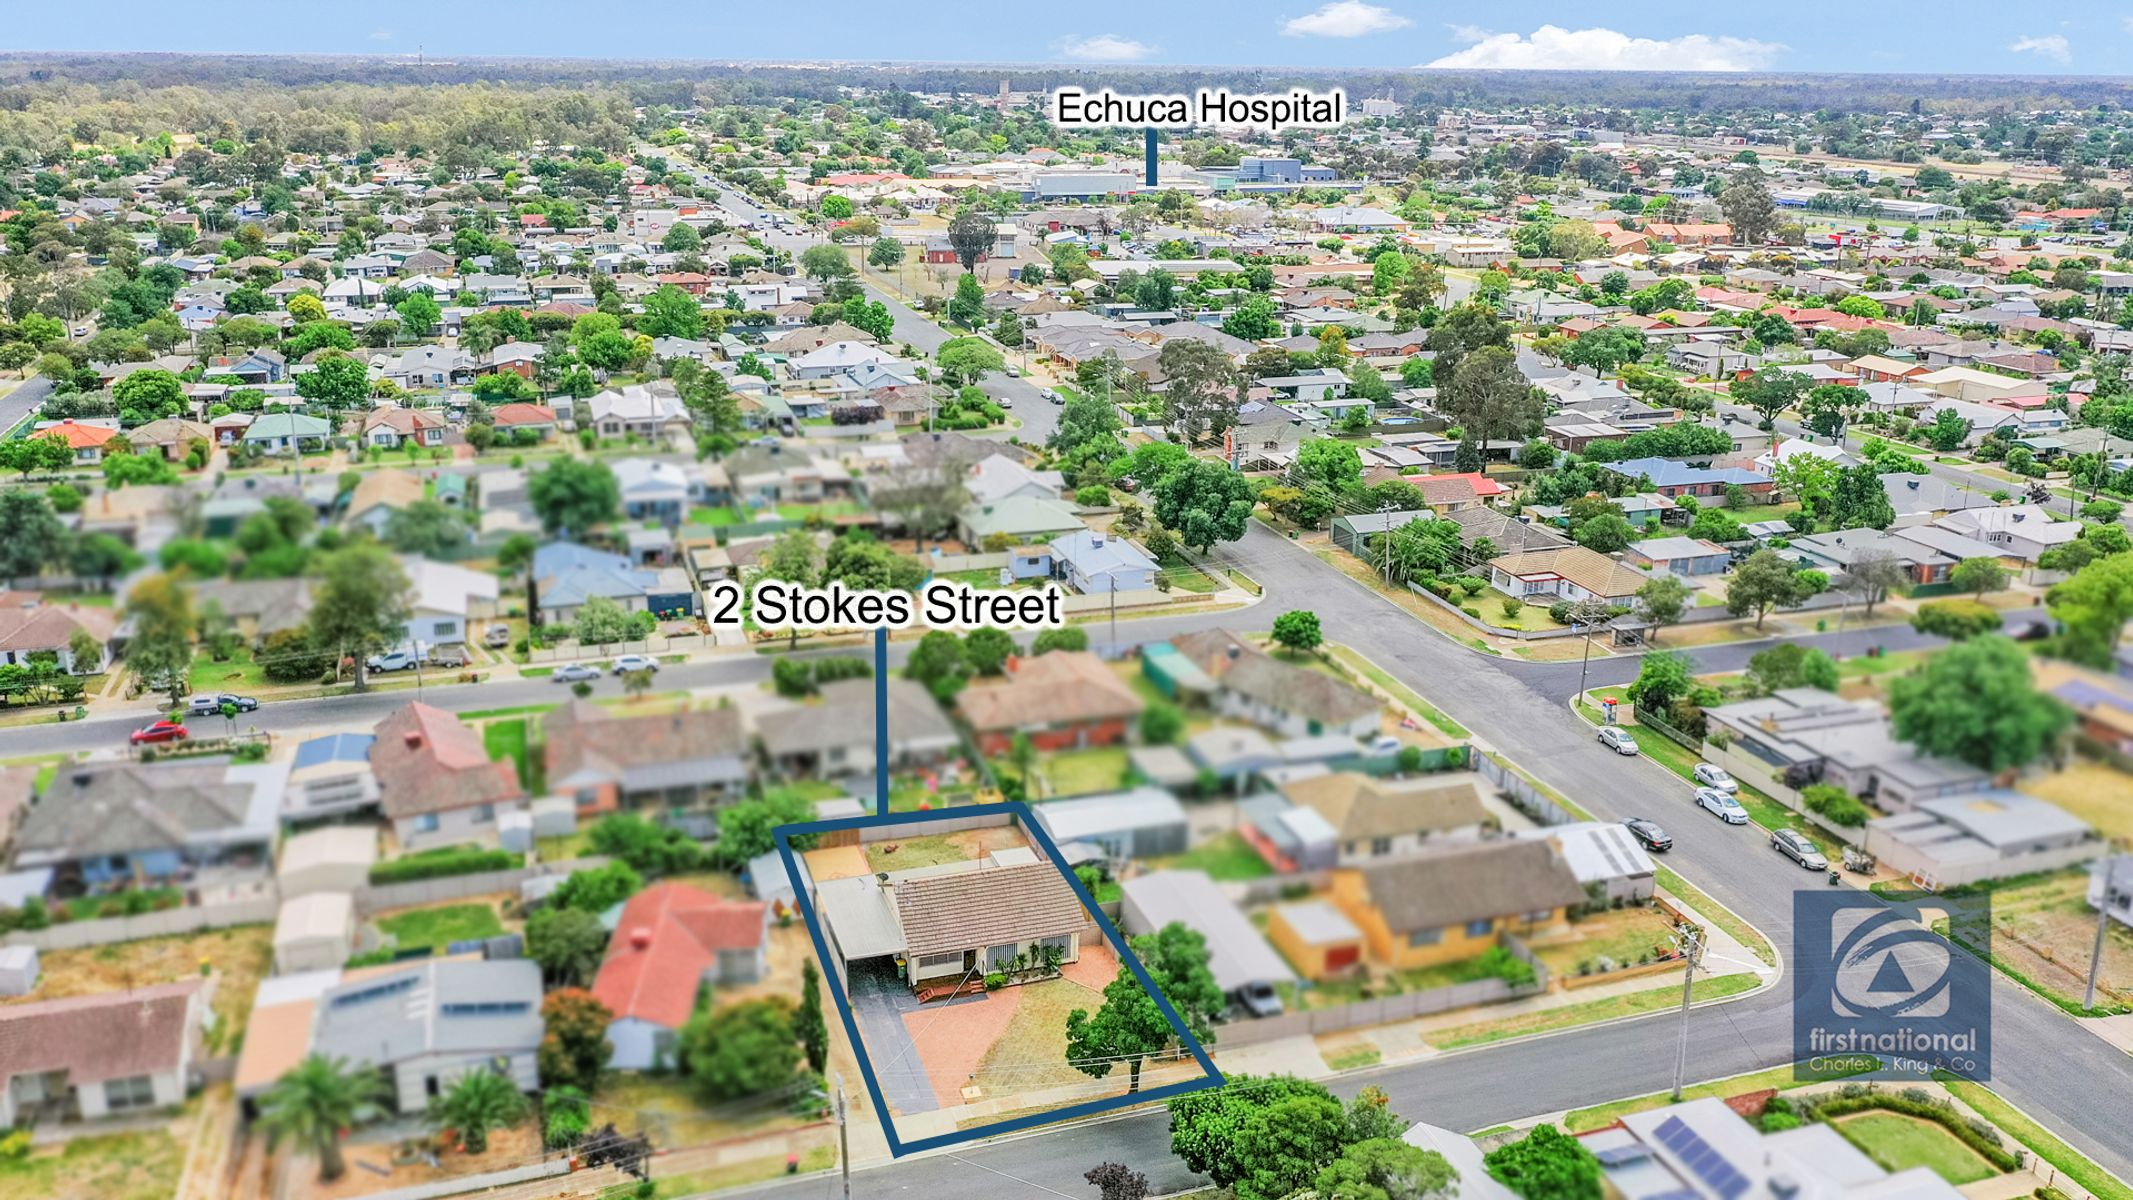 2 Stokes Street, Echuca, VIC 3564